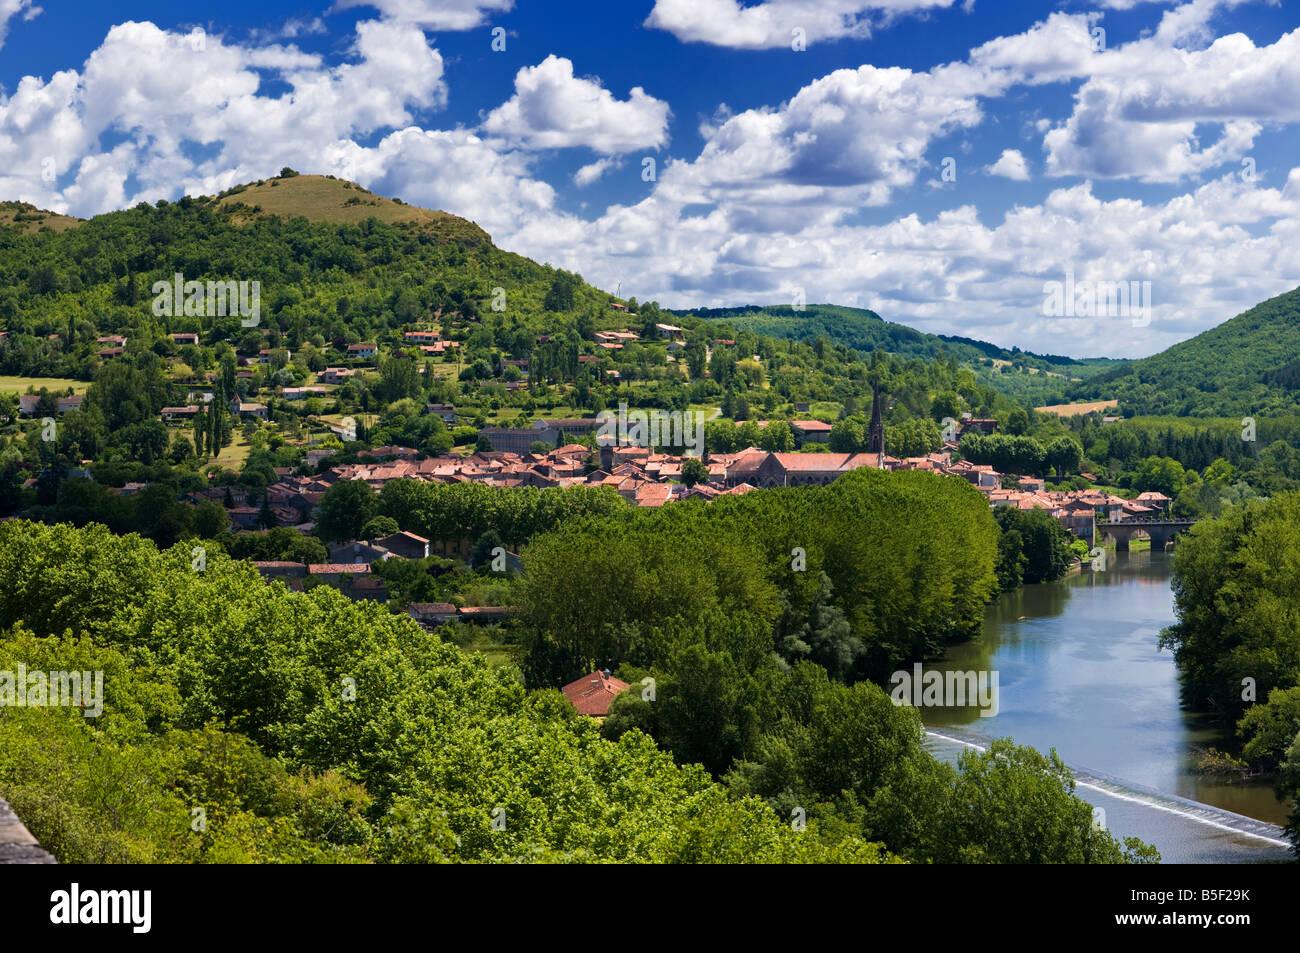 Saint Antonin Noble Val and the River Aveyron, Tarn et Garonne, France Europe - hires capture - Stock Image